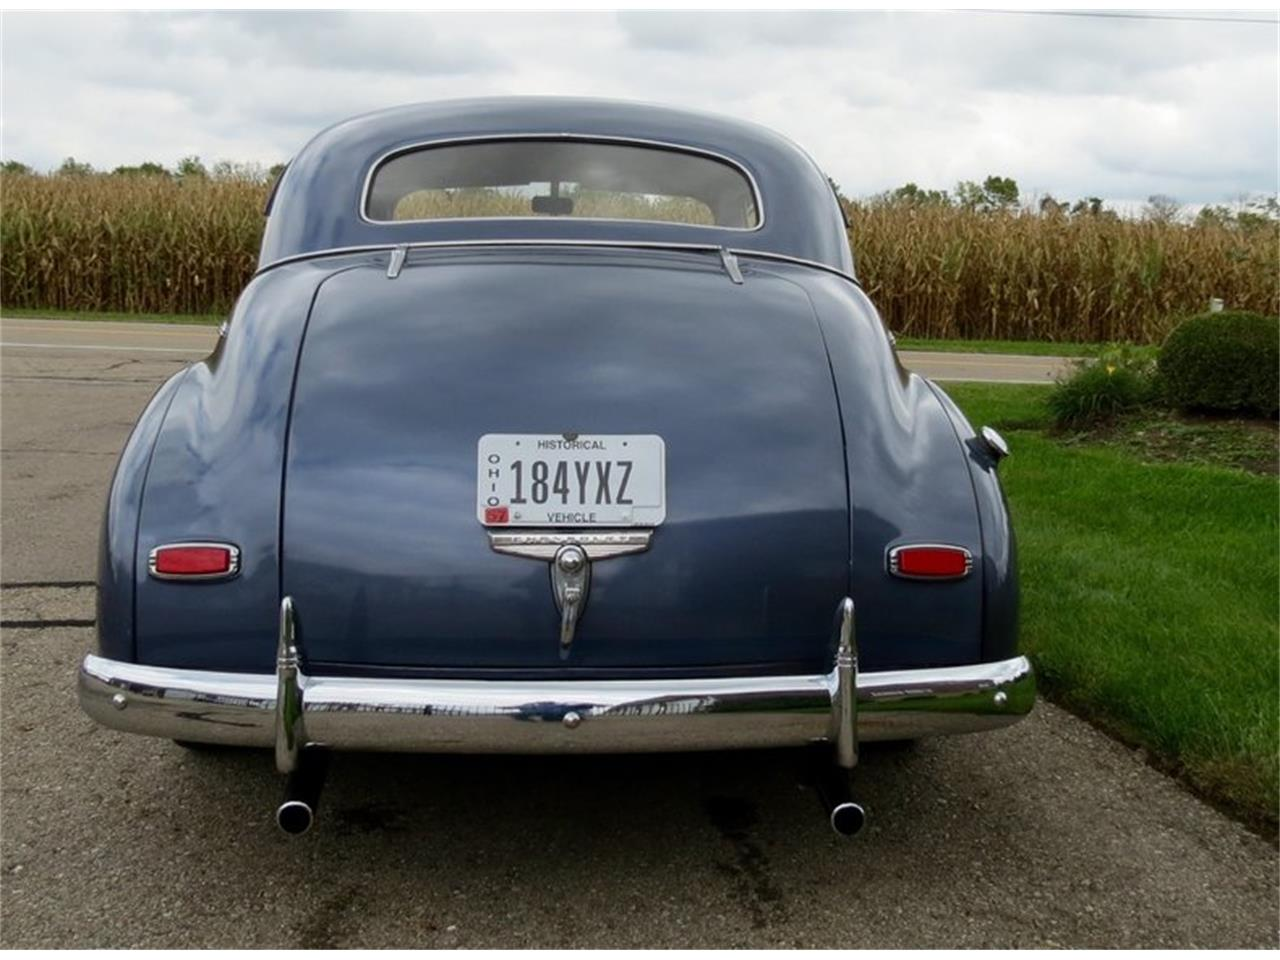 Chevy Dealers Dayton Ohio >> 1941 Chevrolet Coupe for Sale | ClassicCars.com | CC-909867